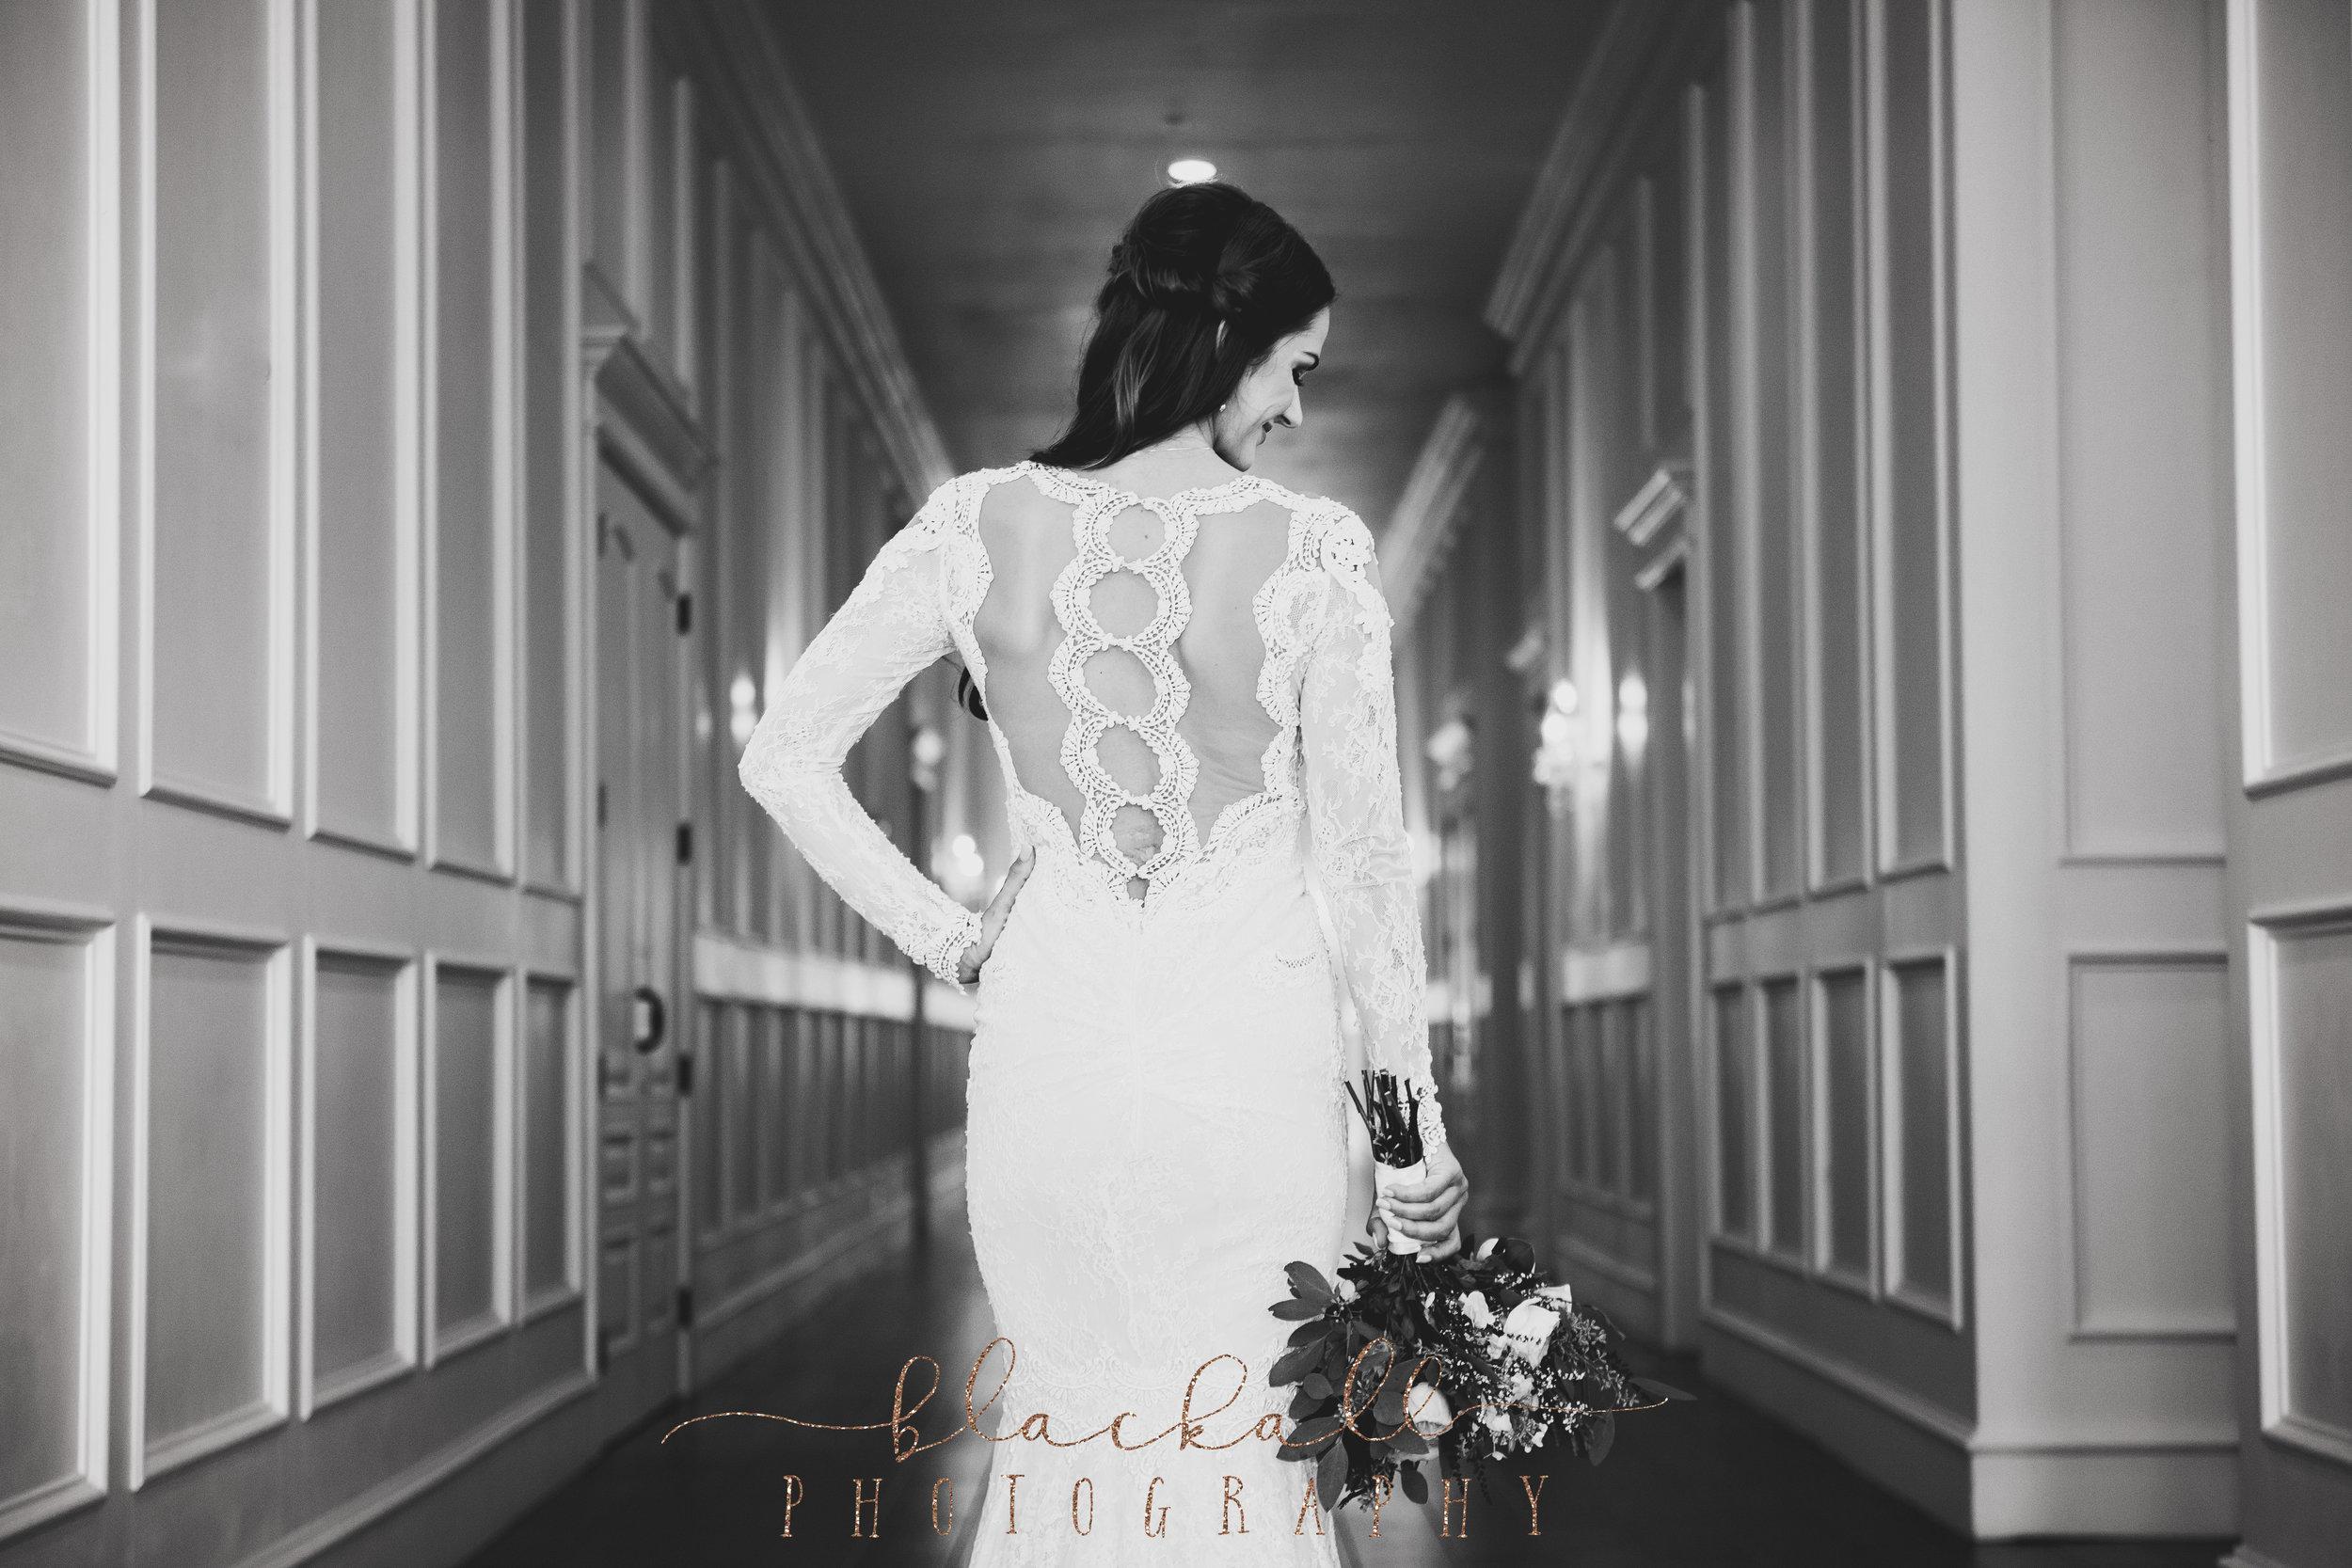 BRIDALS_BlackallPhotography_38.JPG